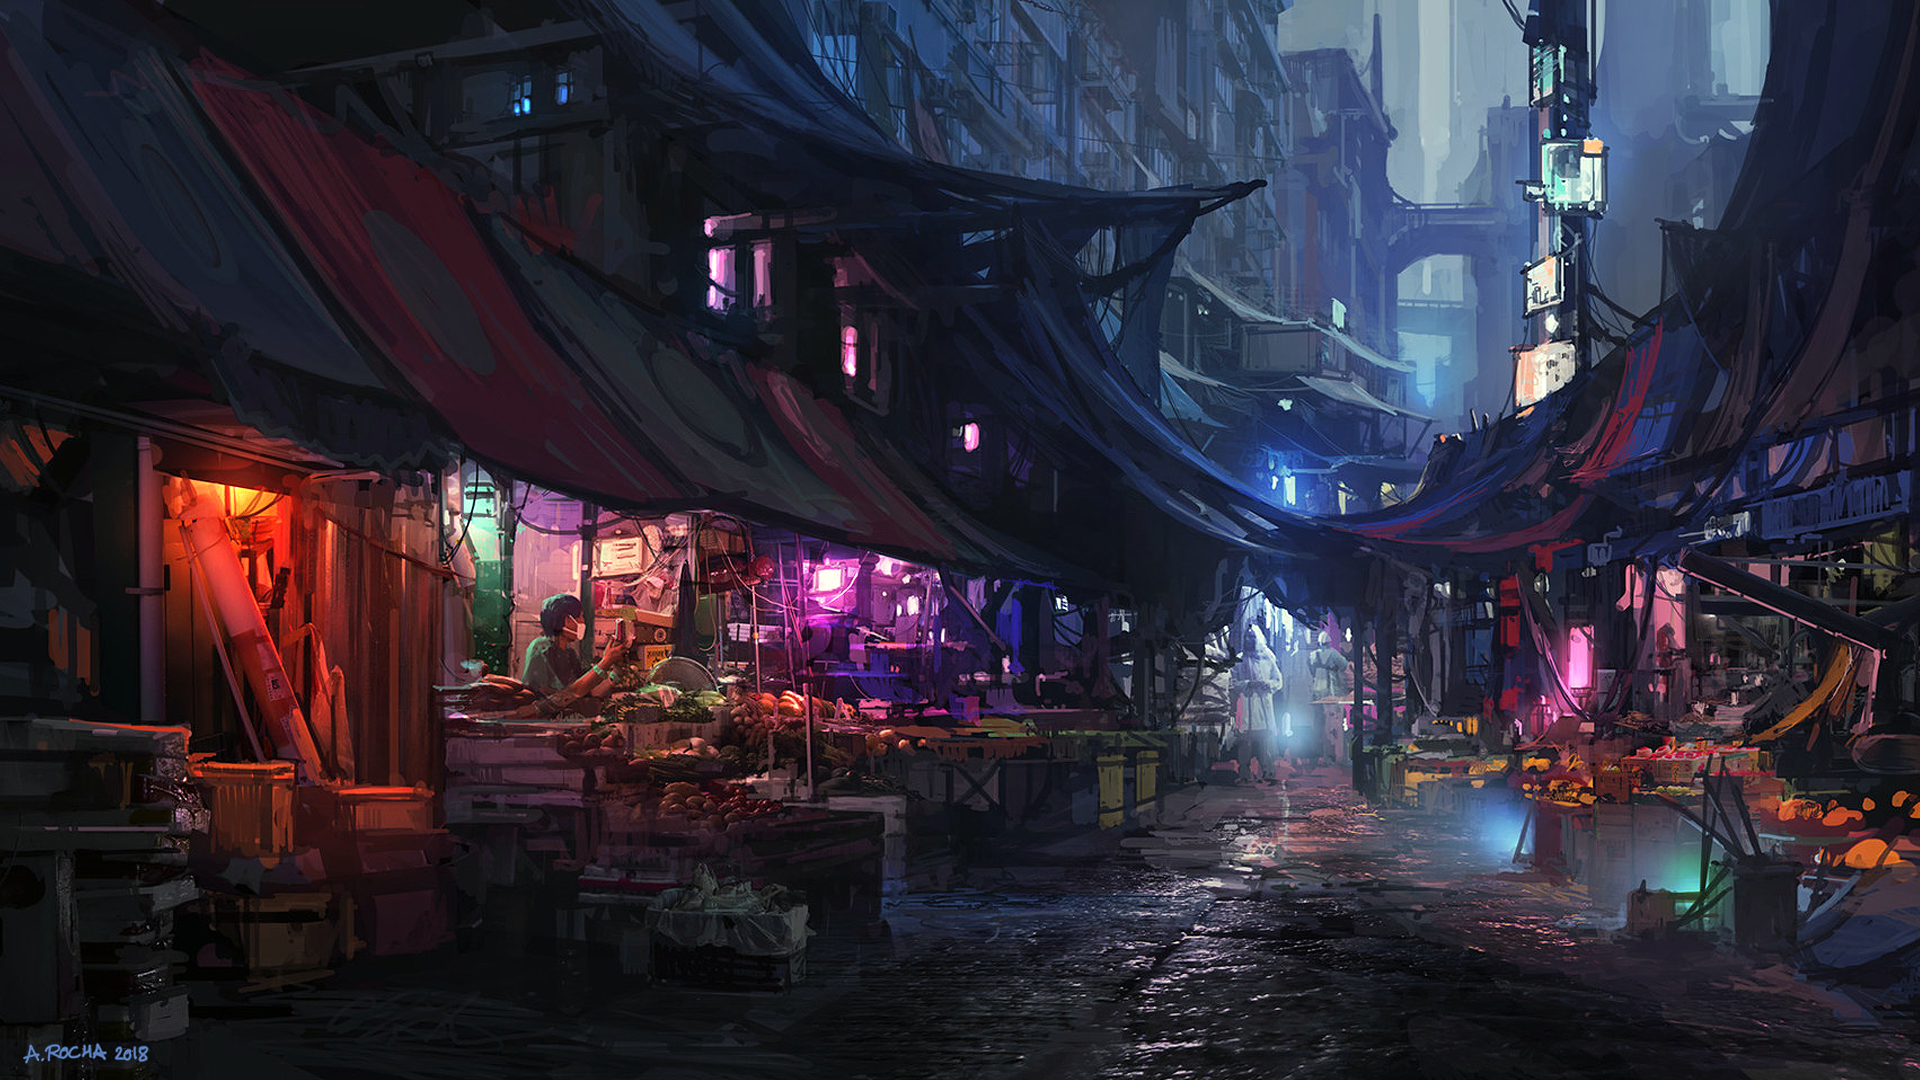 General 1920x1080 Andreas Rocha artwork digital art Market city street cityscape futuristic city 2018 (Year)